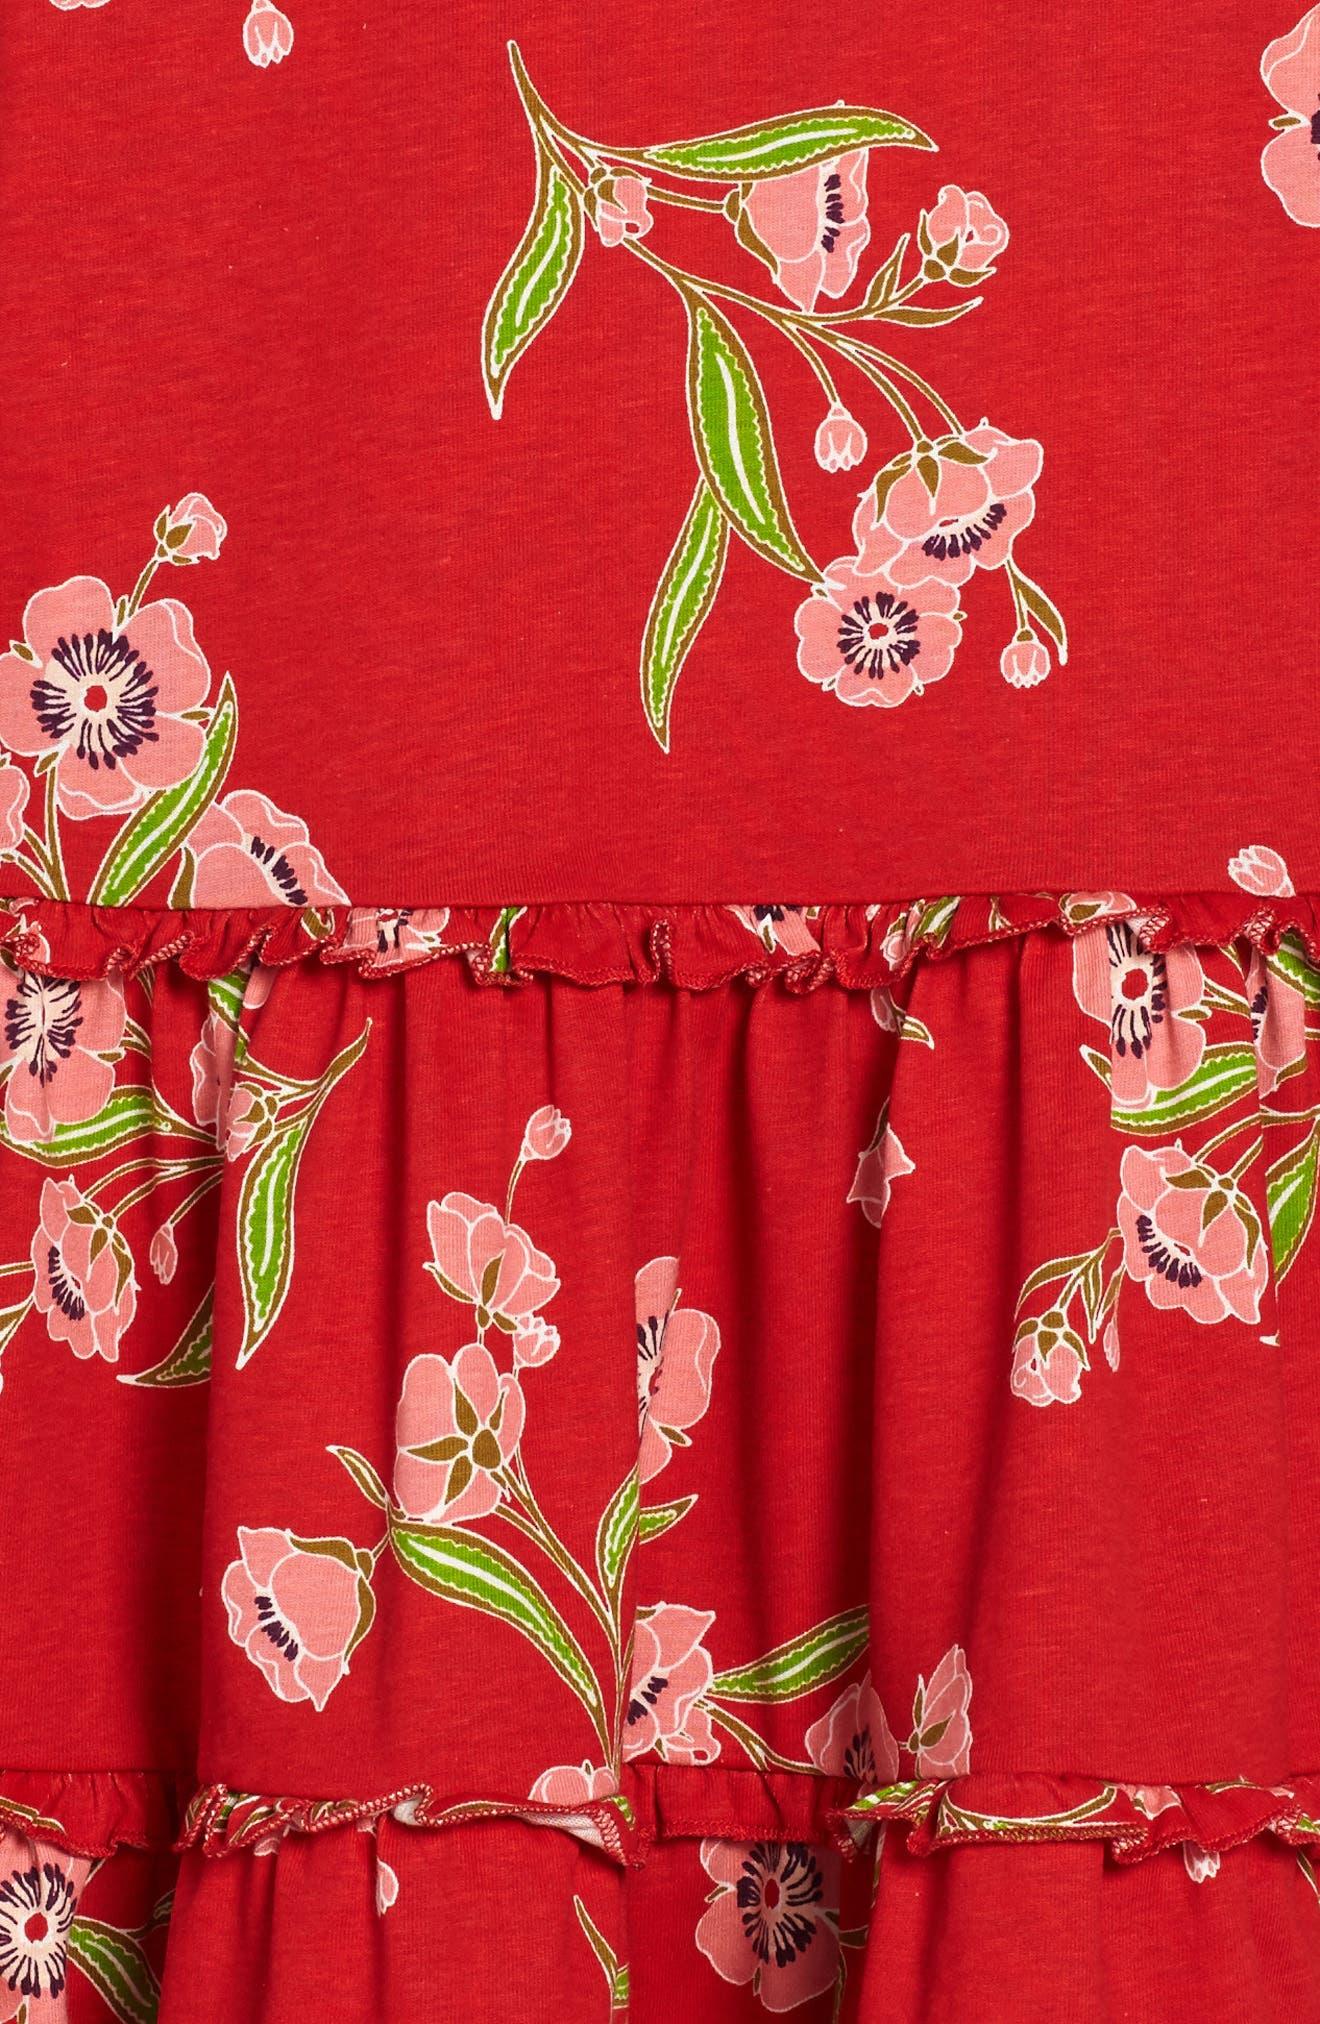 Rowan Floral Print Tiered Dress,                             Alternate thumbnail 3, color,                             615